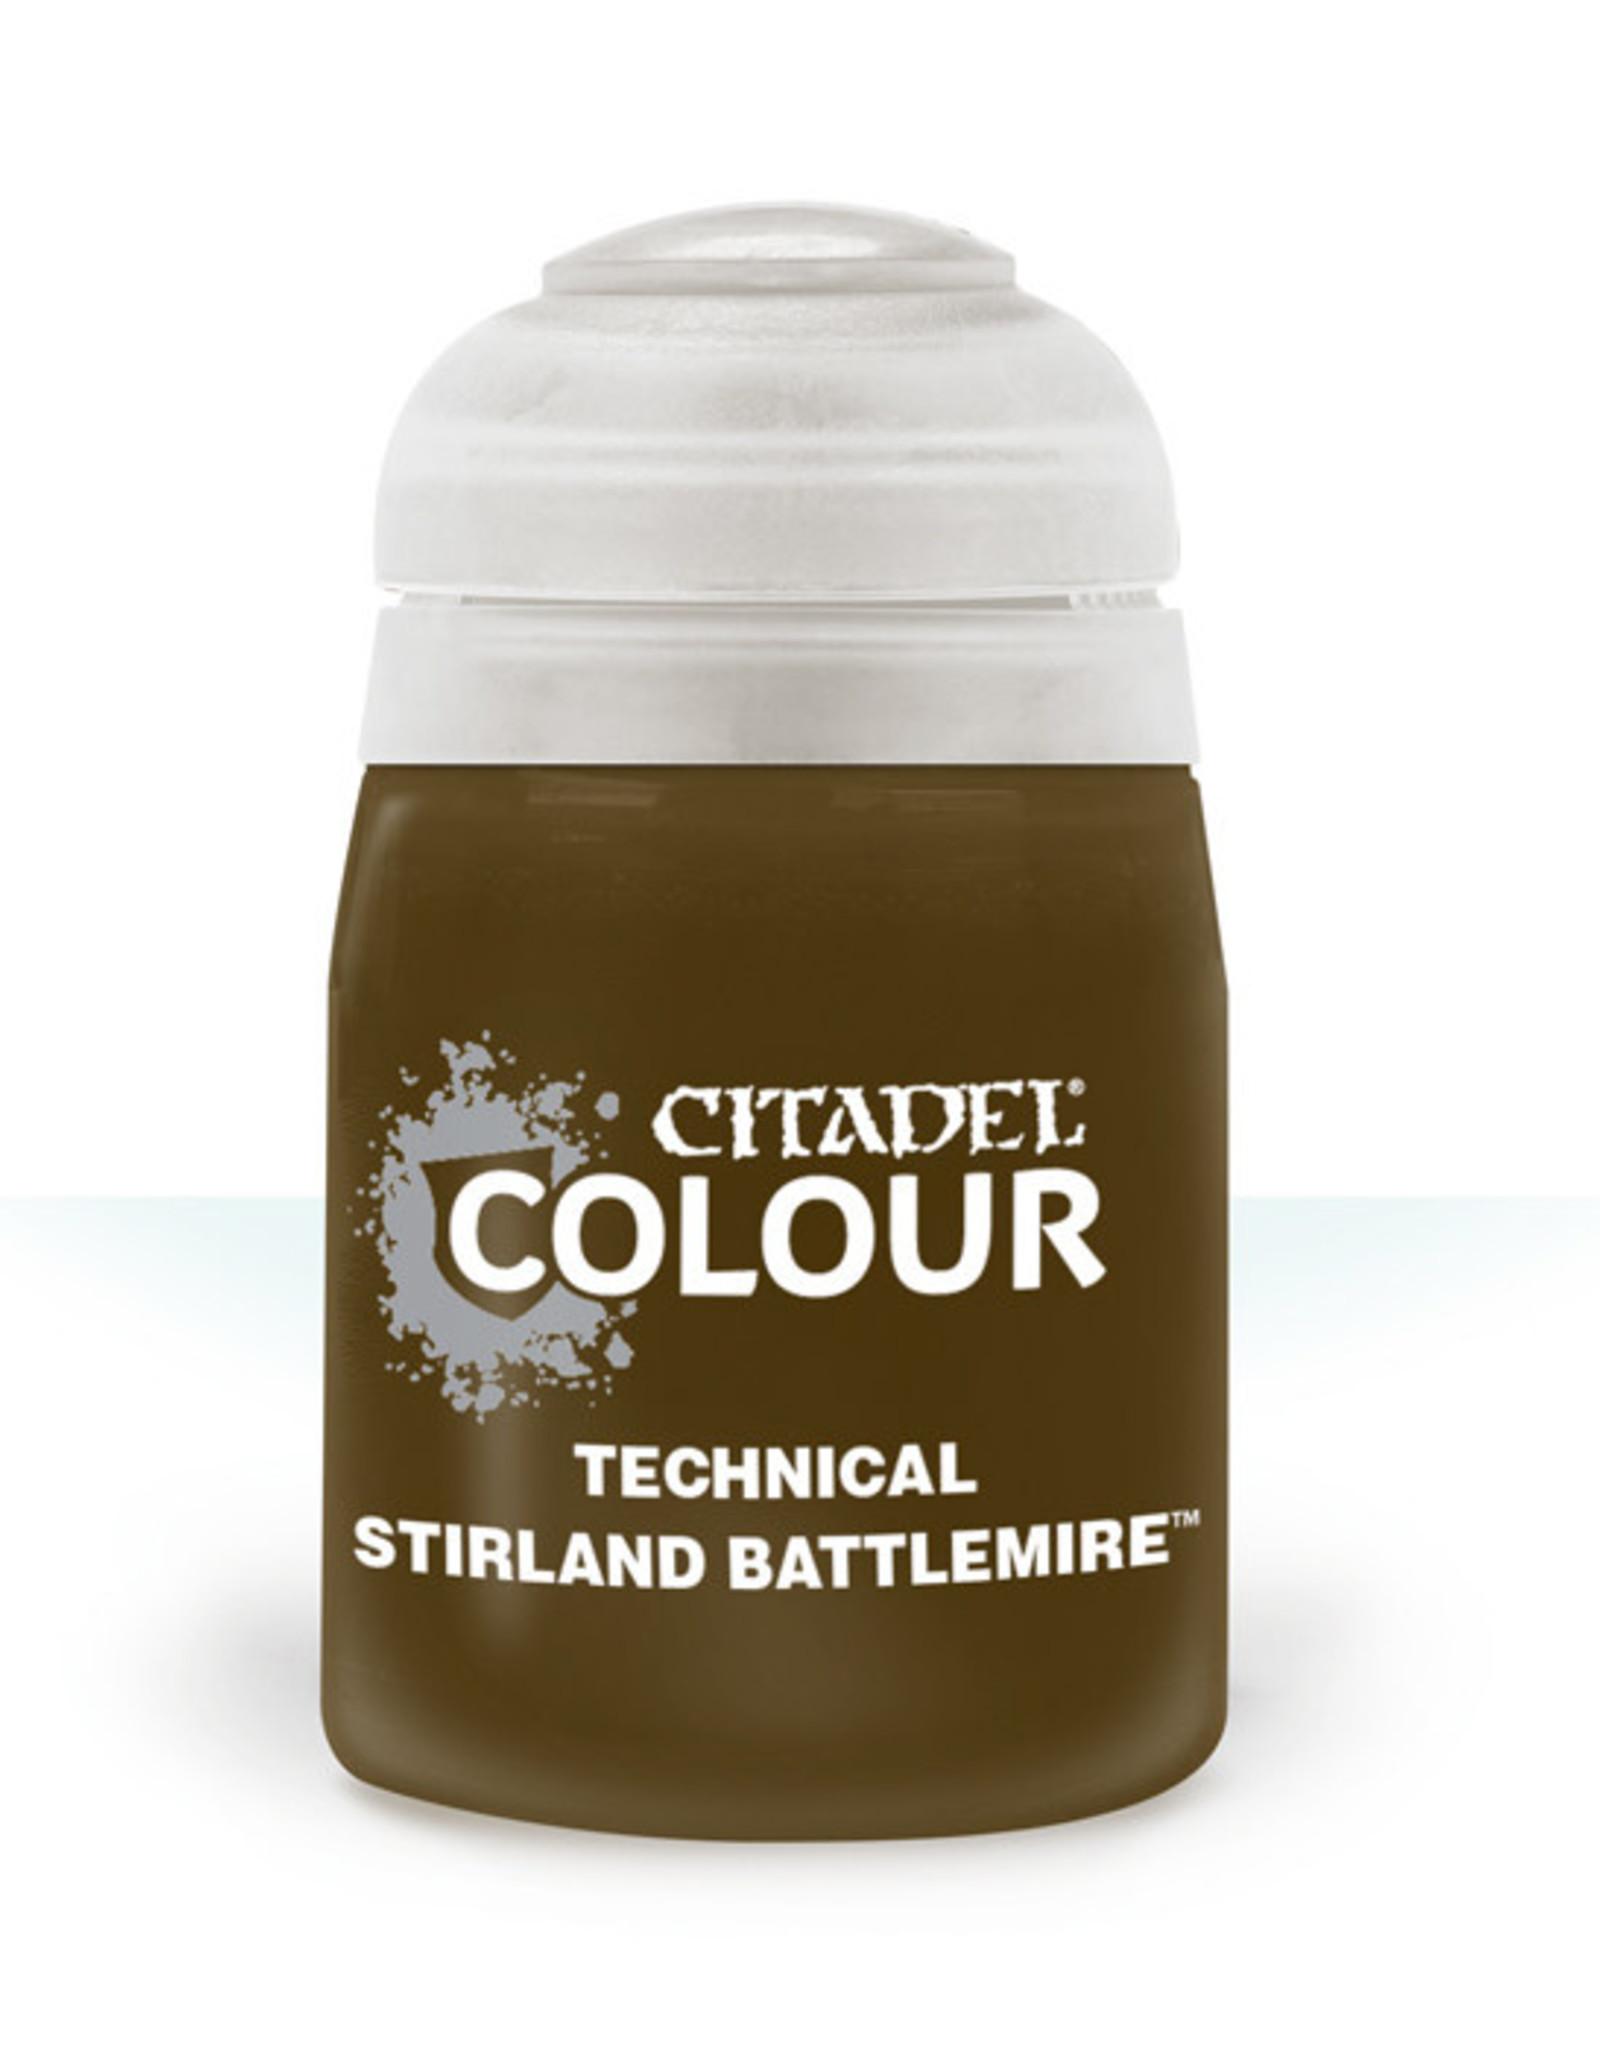 Citadel Citadel Colour: Technical - Stirland Battlemire